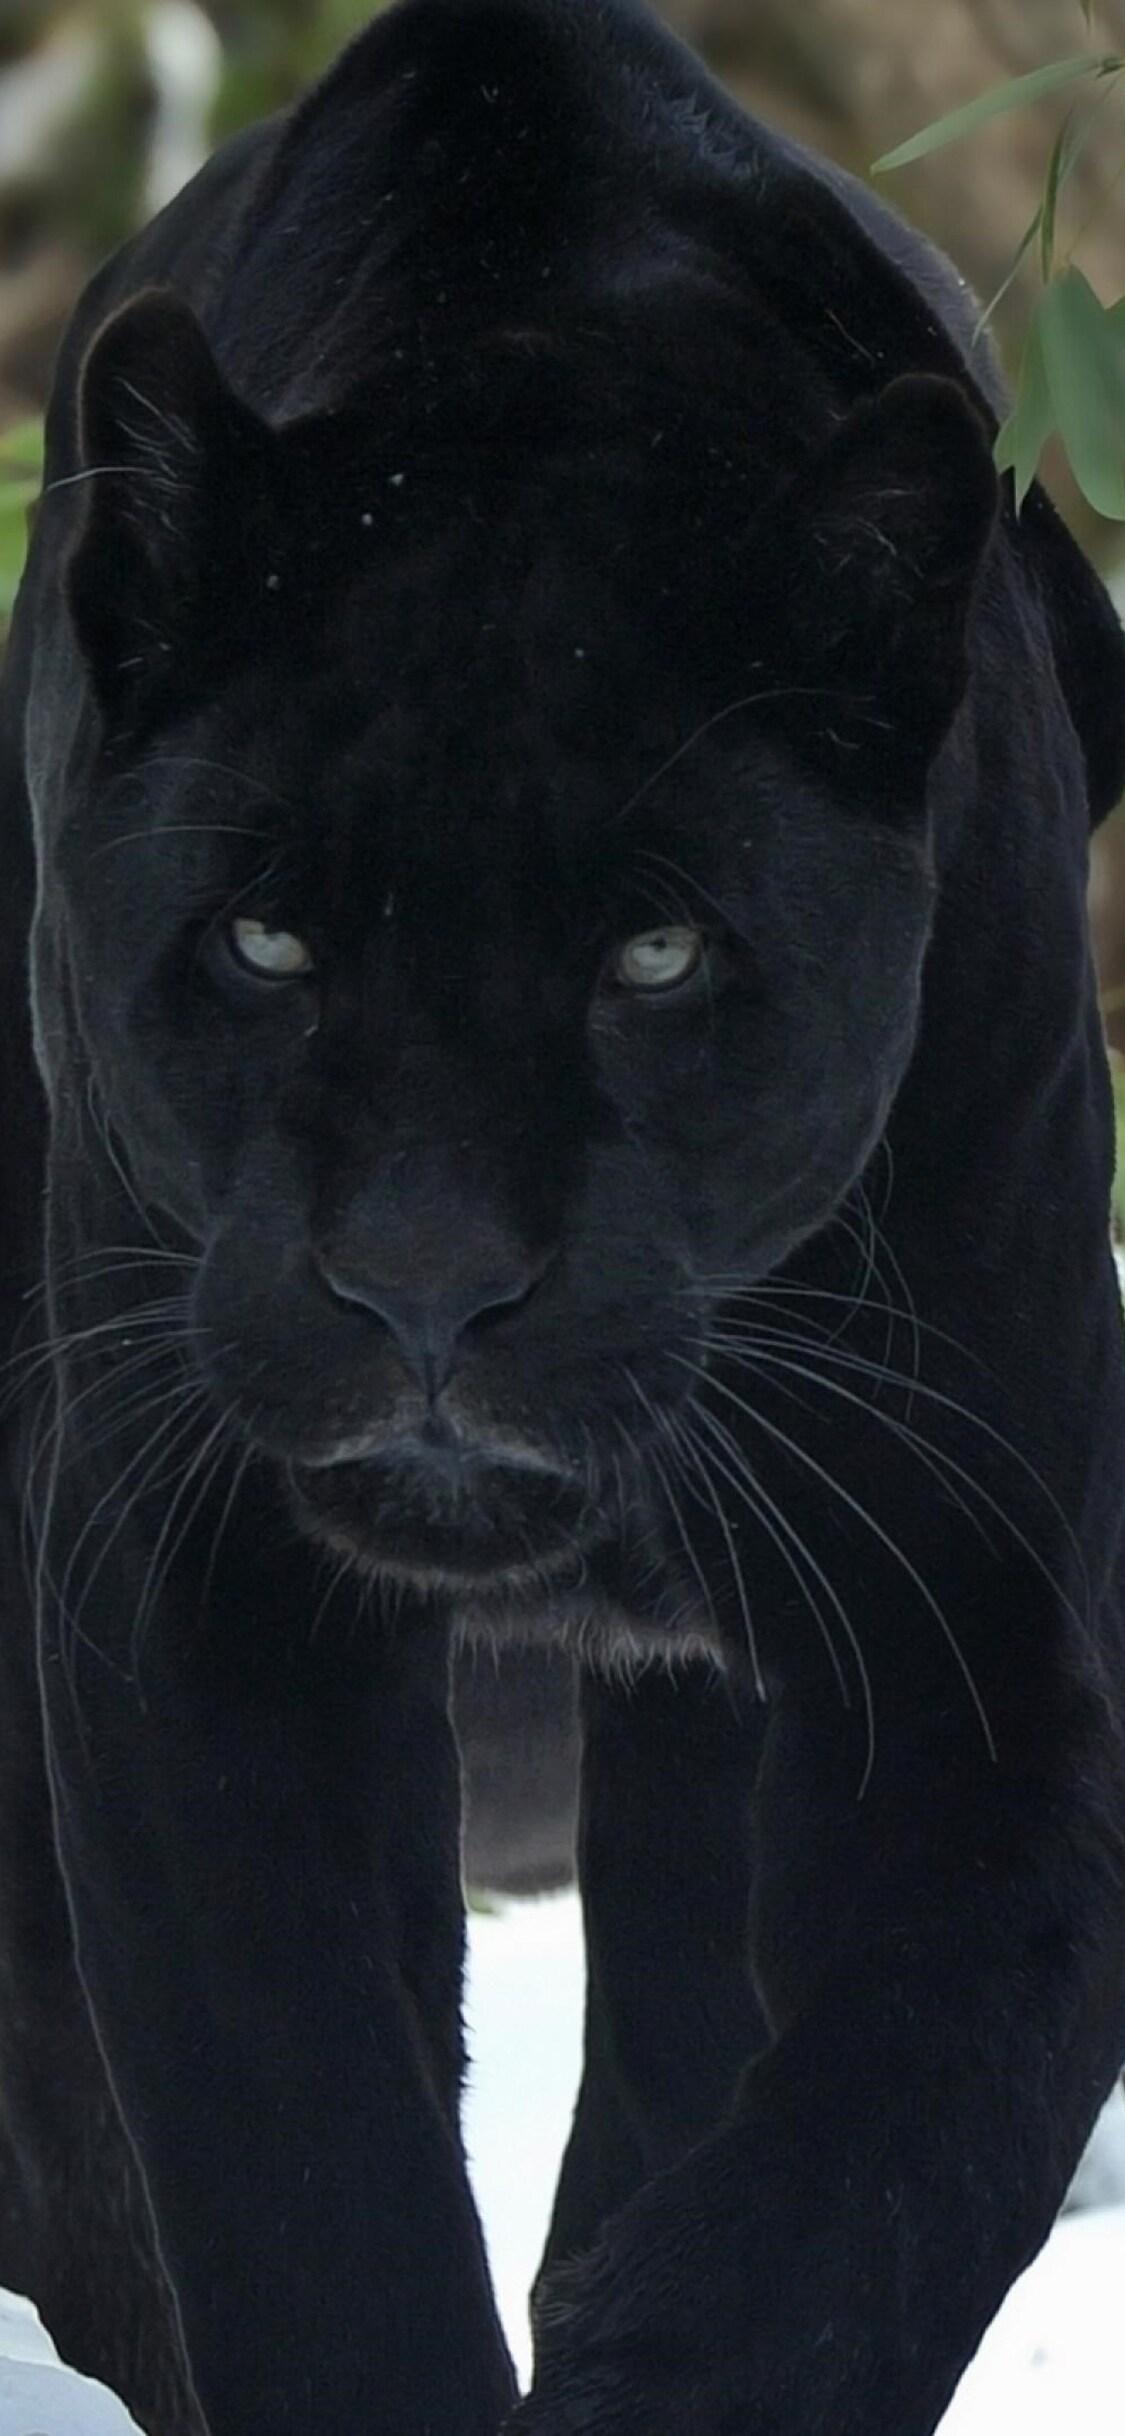 1125x2436 Black Panther Iphone Xs Iphone 10 Iphone X Hd 4k